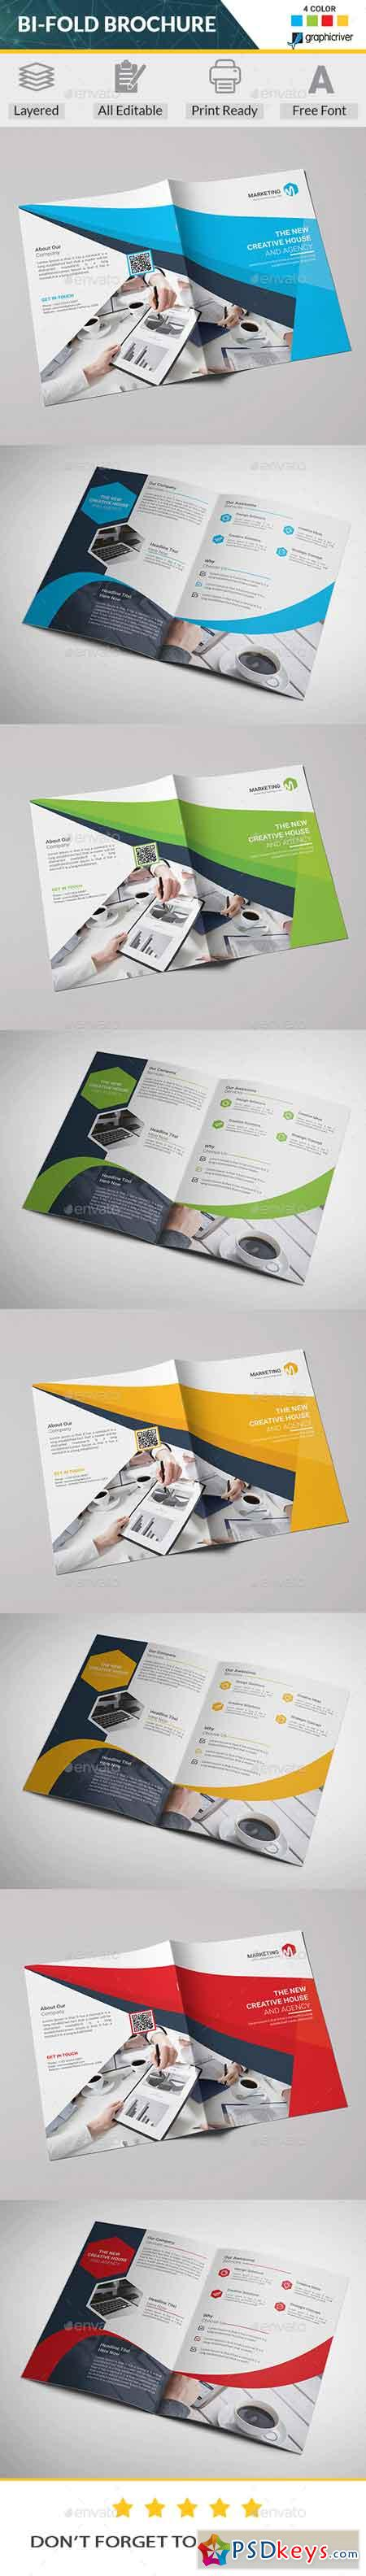 Bi-Fold Brochure 20161675